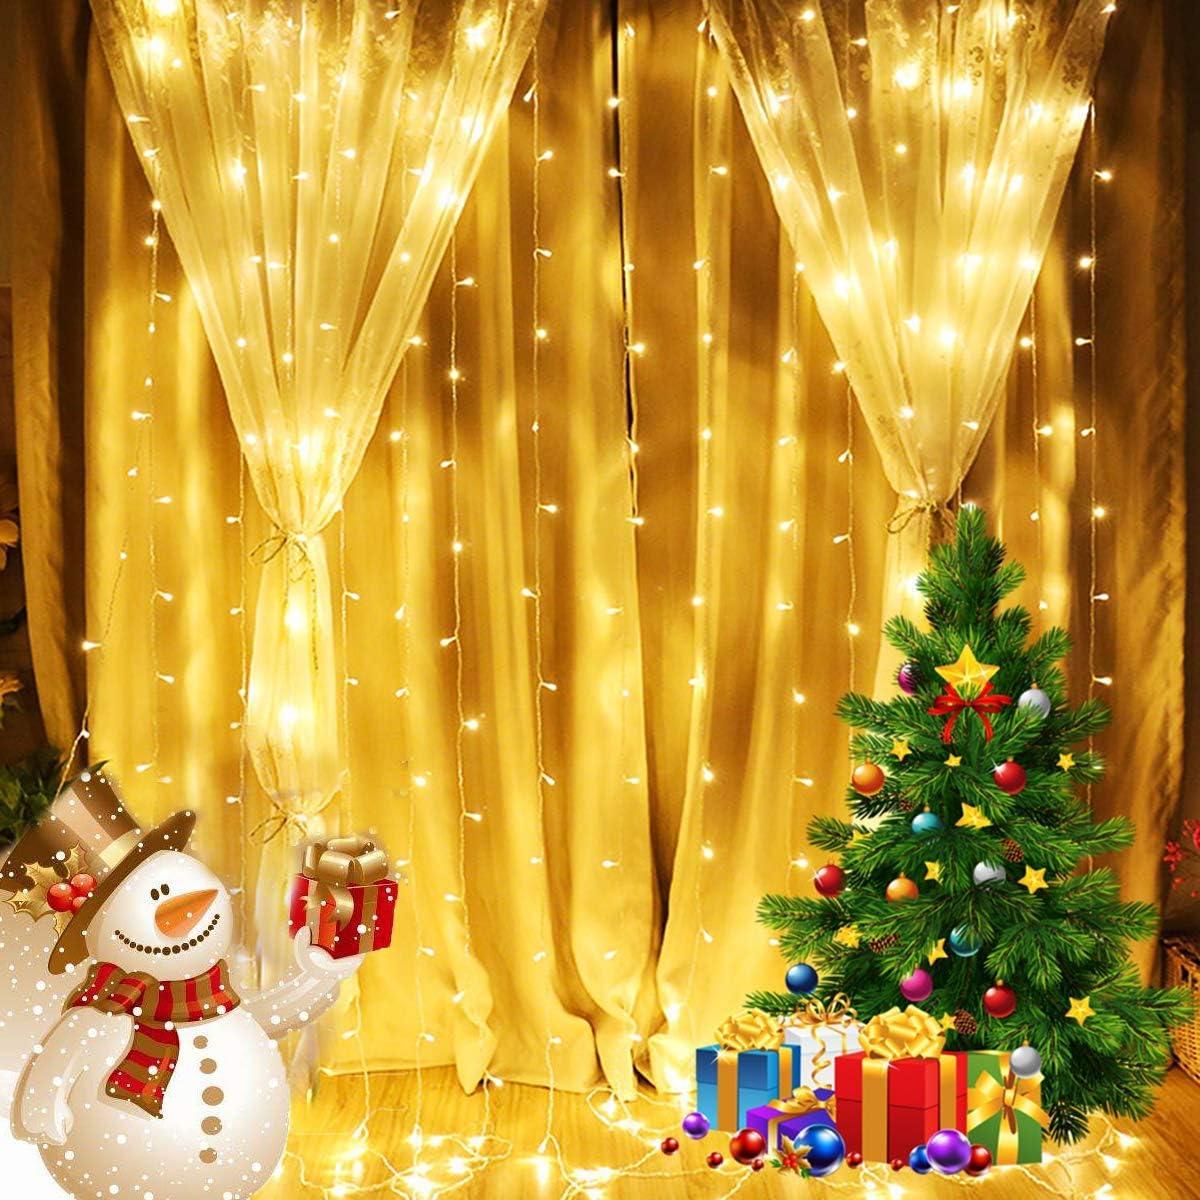 Quntis Christmas Decoration Curtain Lights - 300 Soldering LEDs Albuquerque Mall Fairy Icic